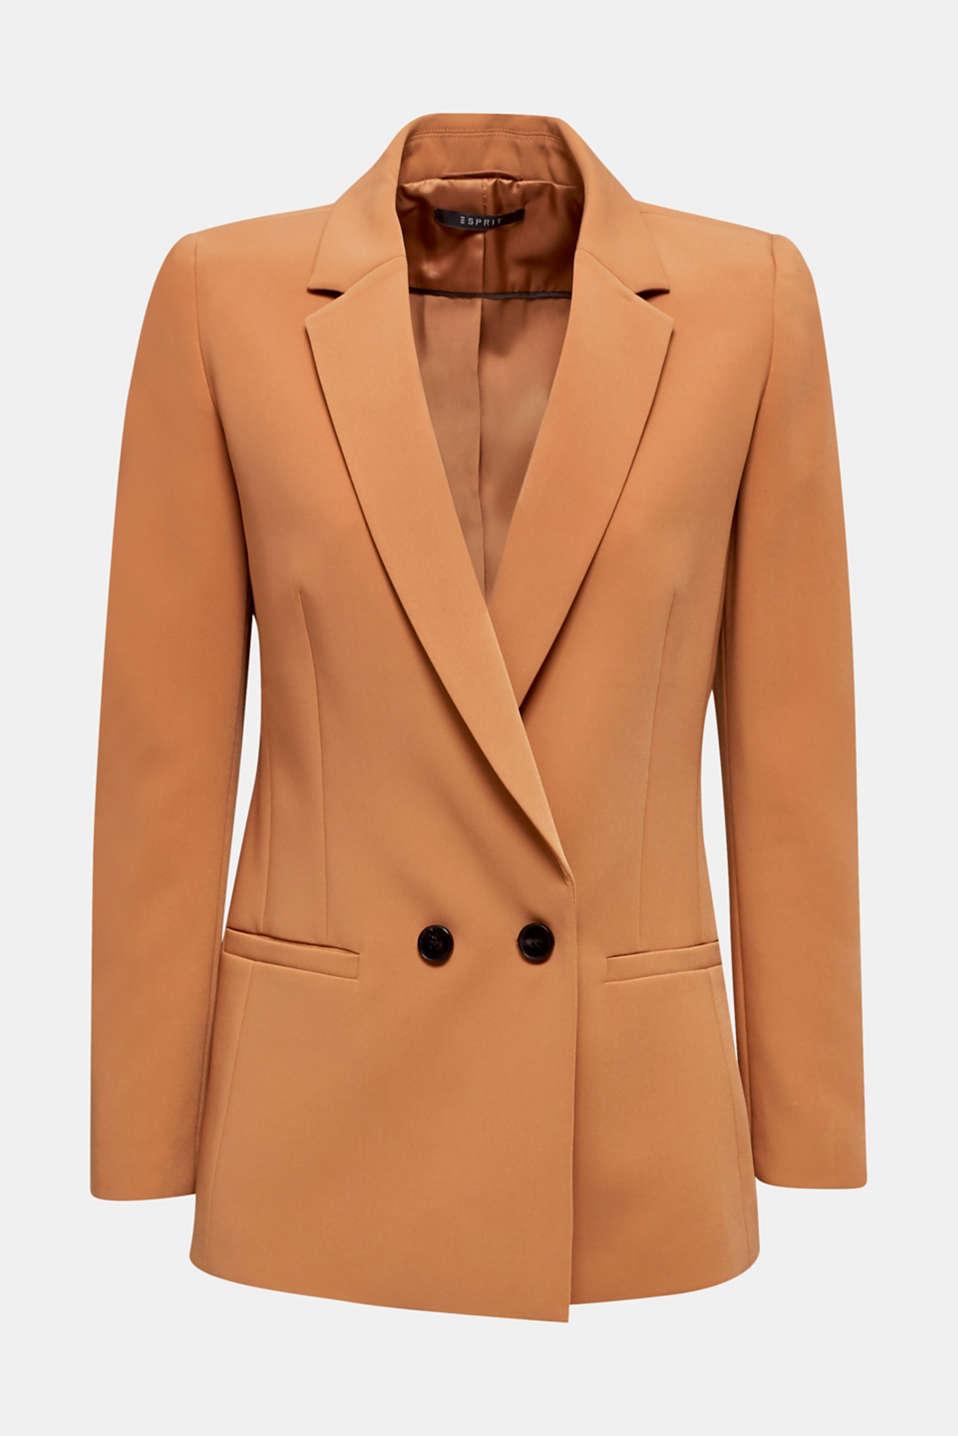 TECHNO TWILL mix + match stretch blazer, TOFFEE, detail image number 7